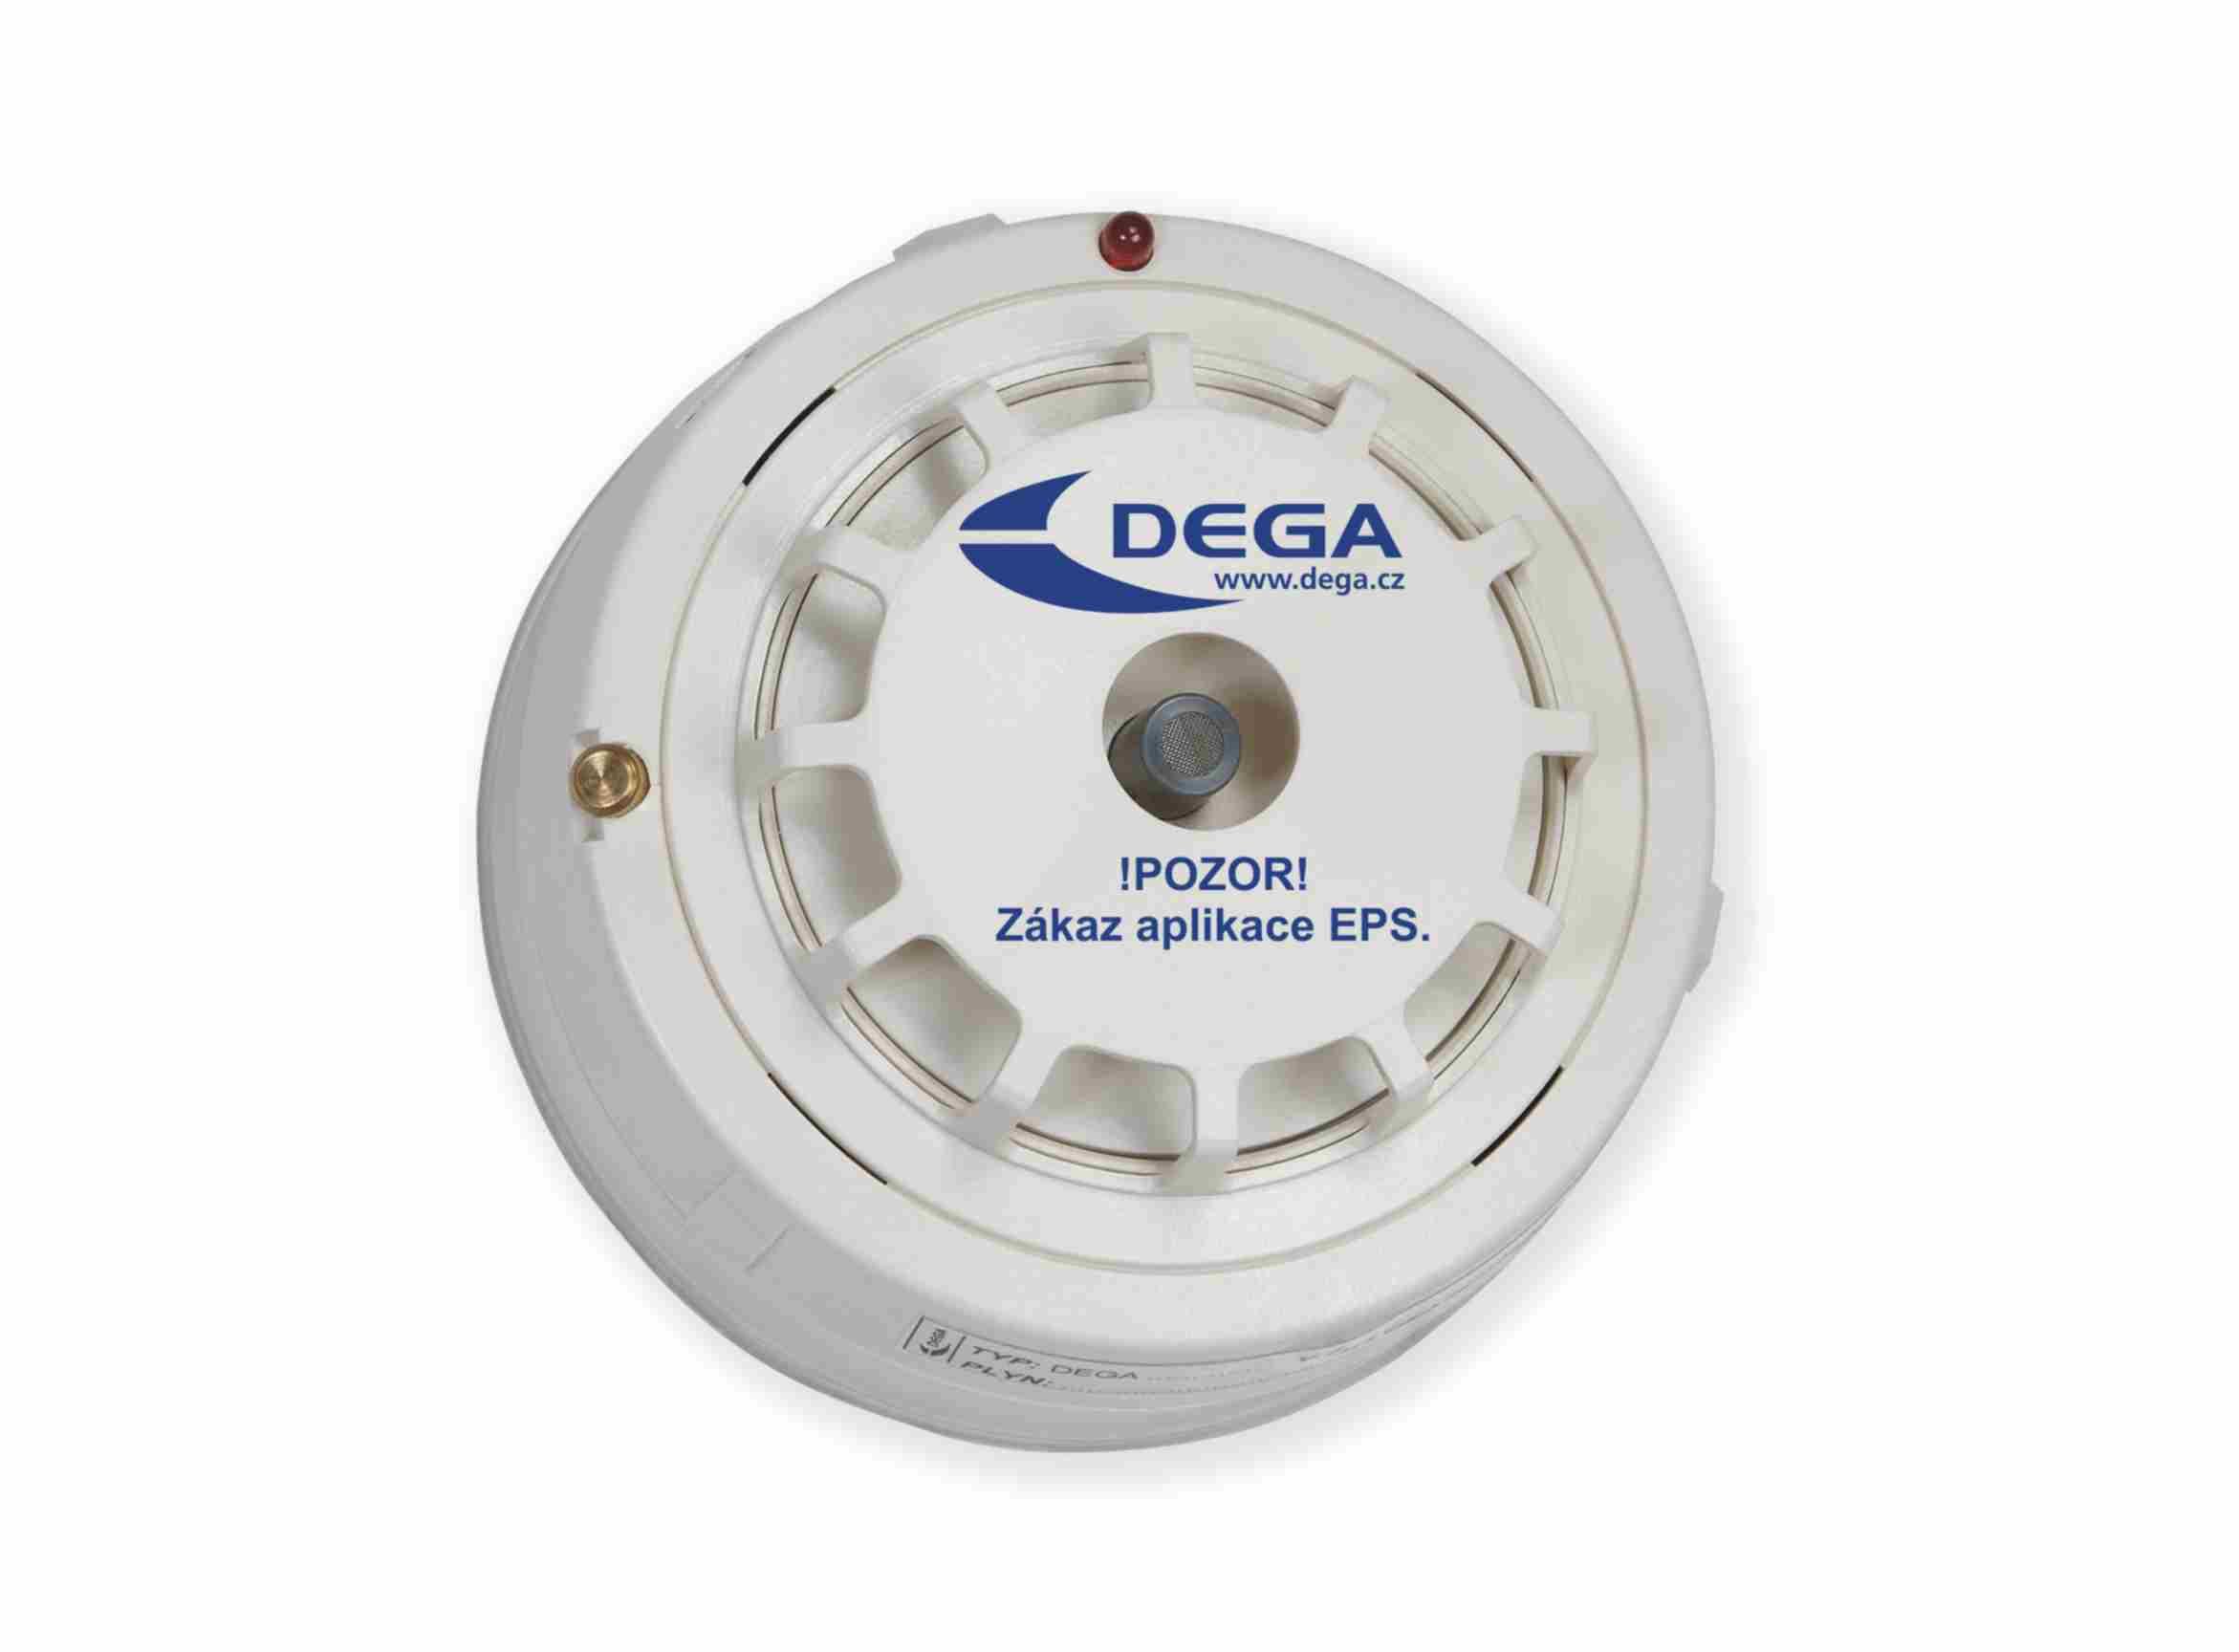 Gas Detector Dega